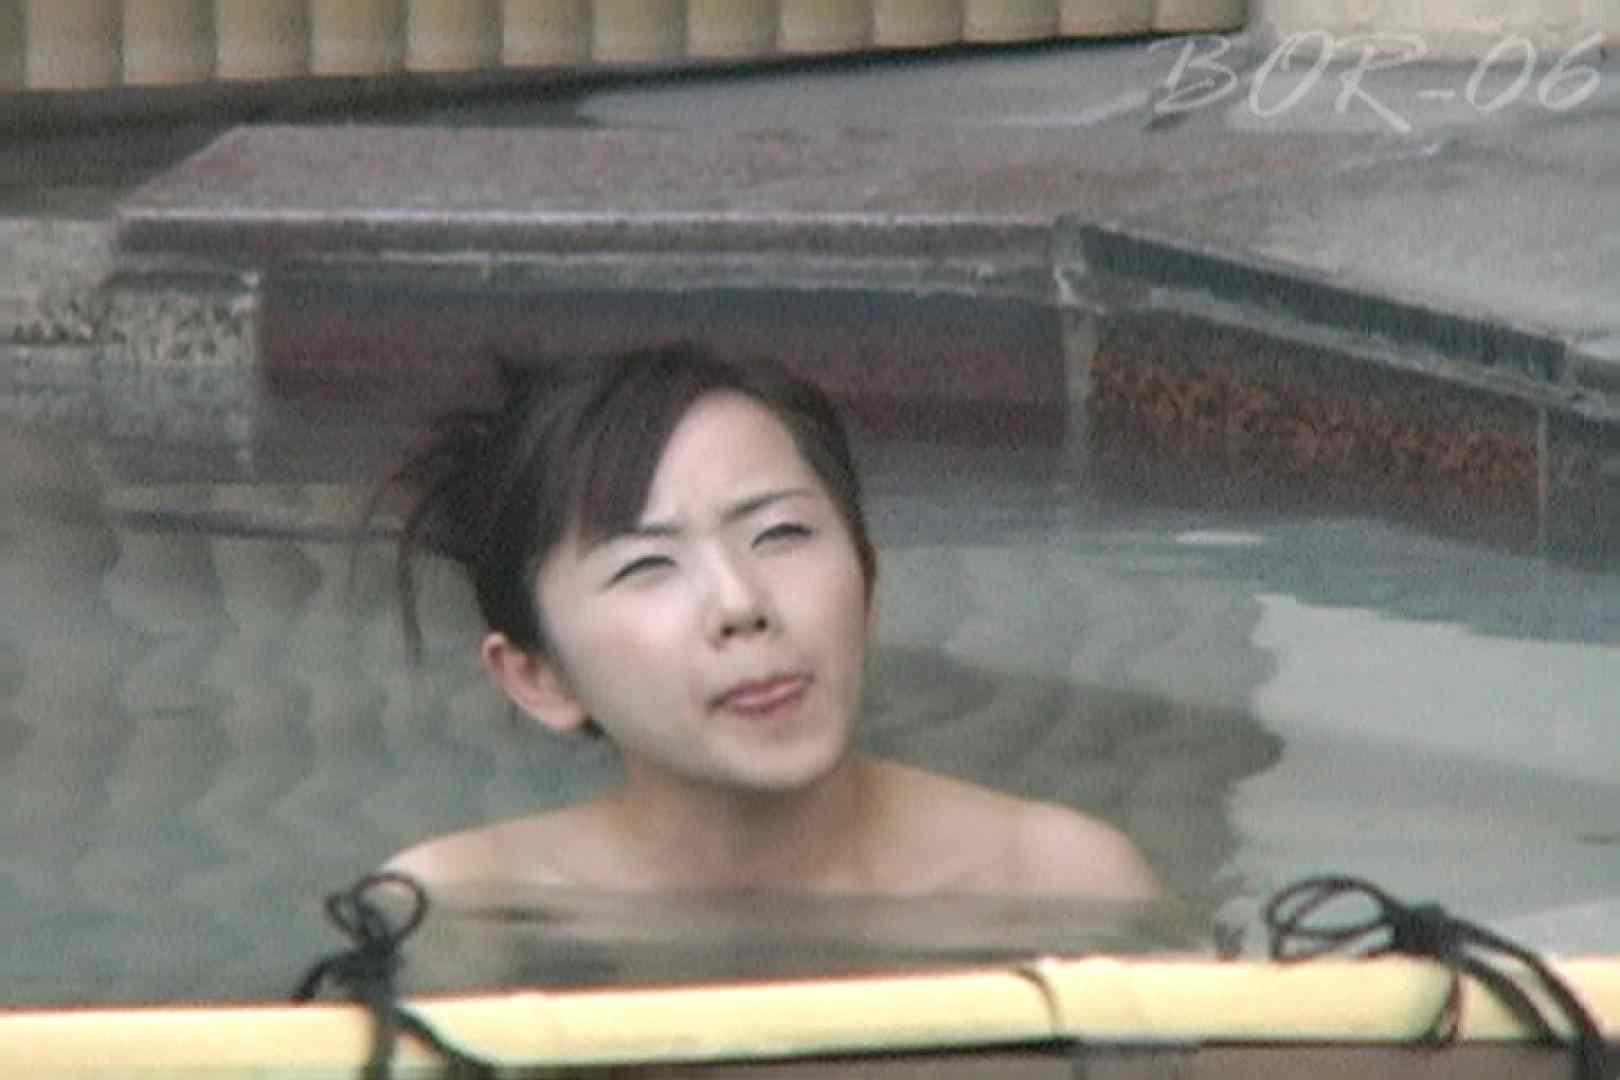 Aquaな露天風呂Vol.521 露天 おめこ無修正動画無料 92画像 47